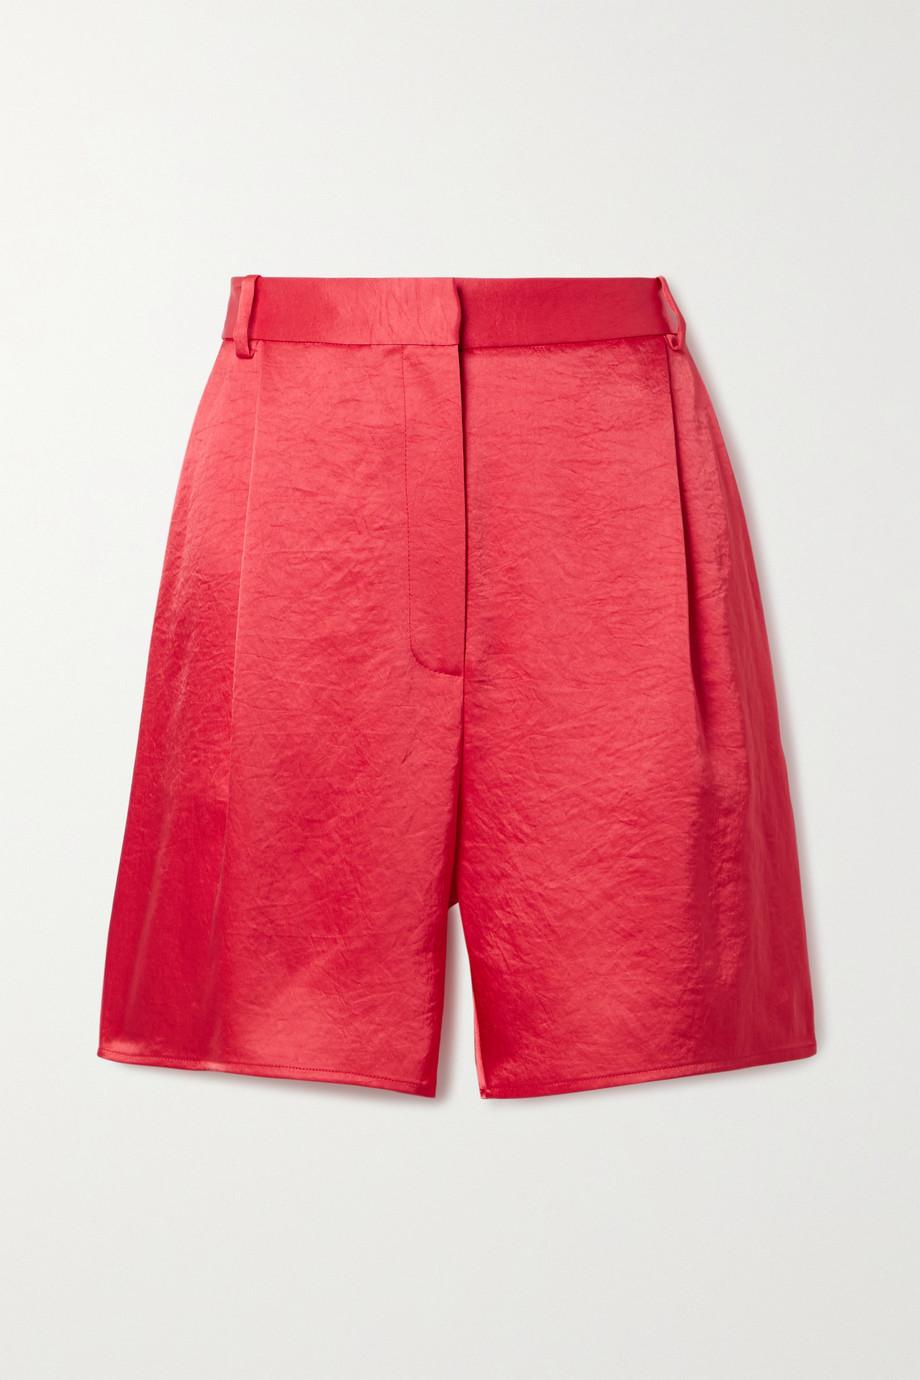 LAPOINTE 褶裥褶皱缎布短裤